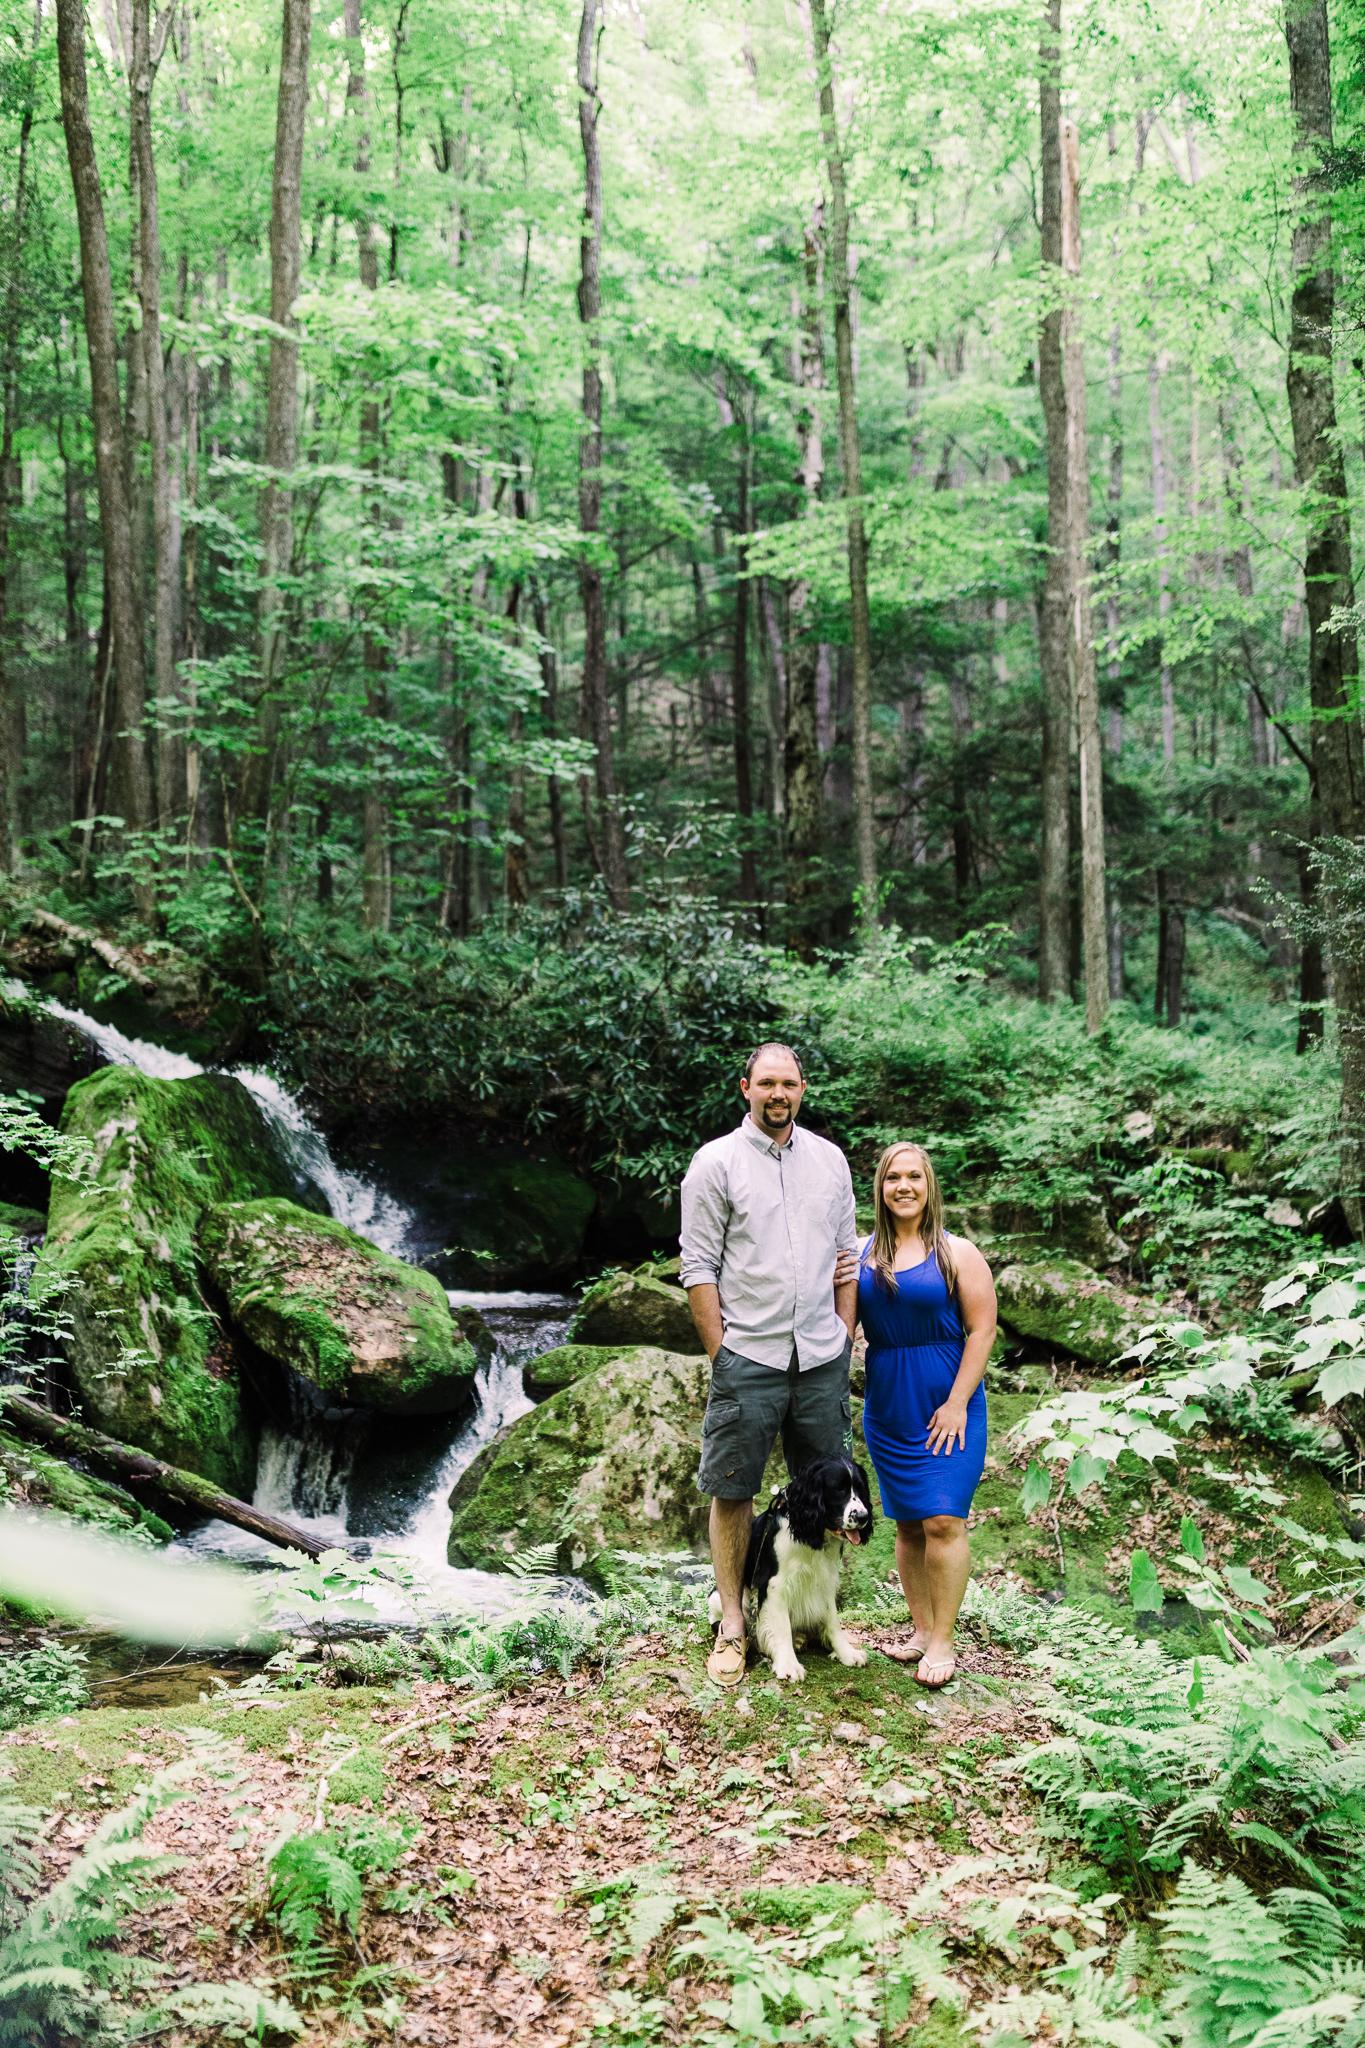 Kettle-creek-state-park-engagement-9604.jpg